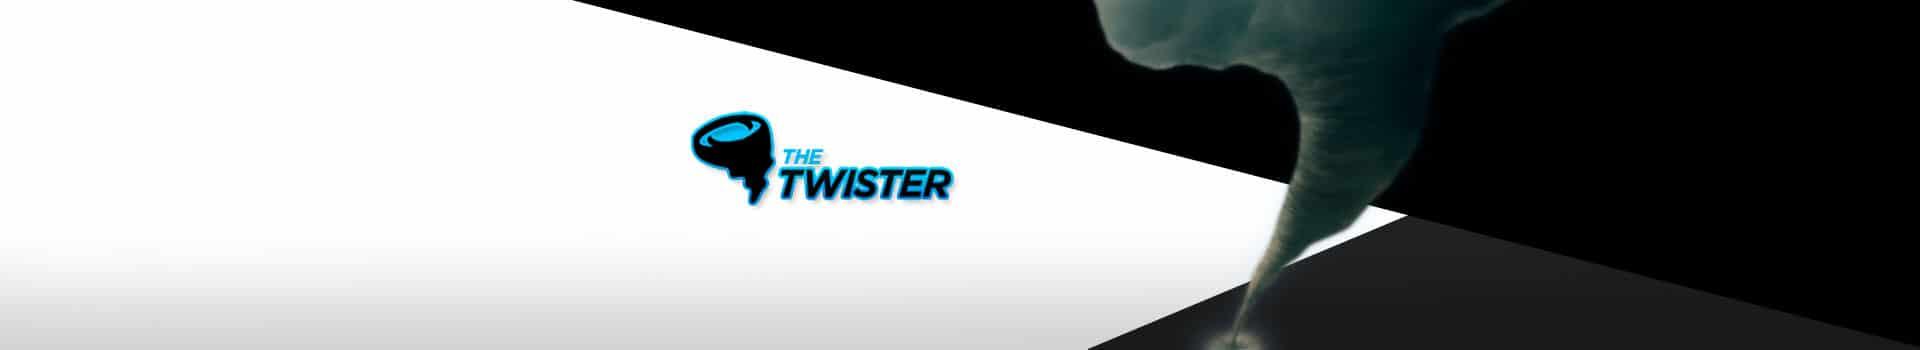 Турнир Twister 888poker